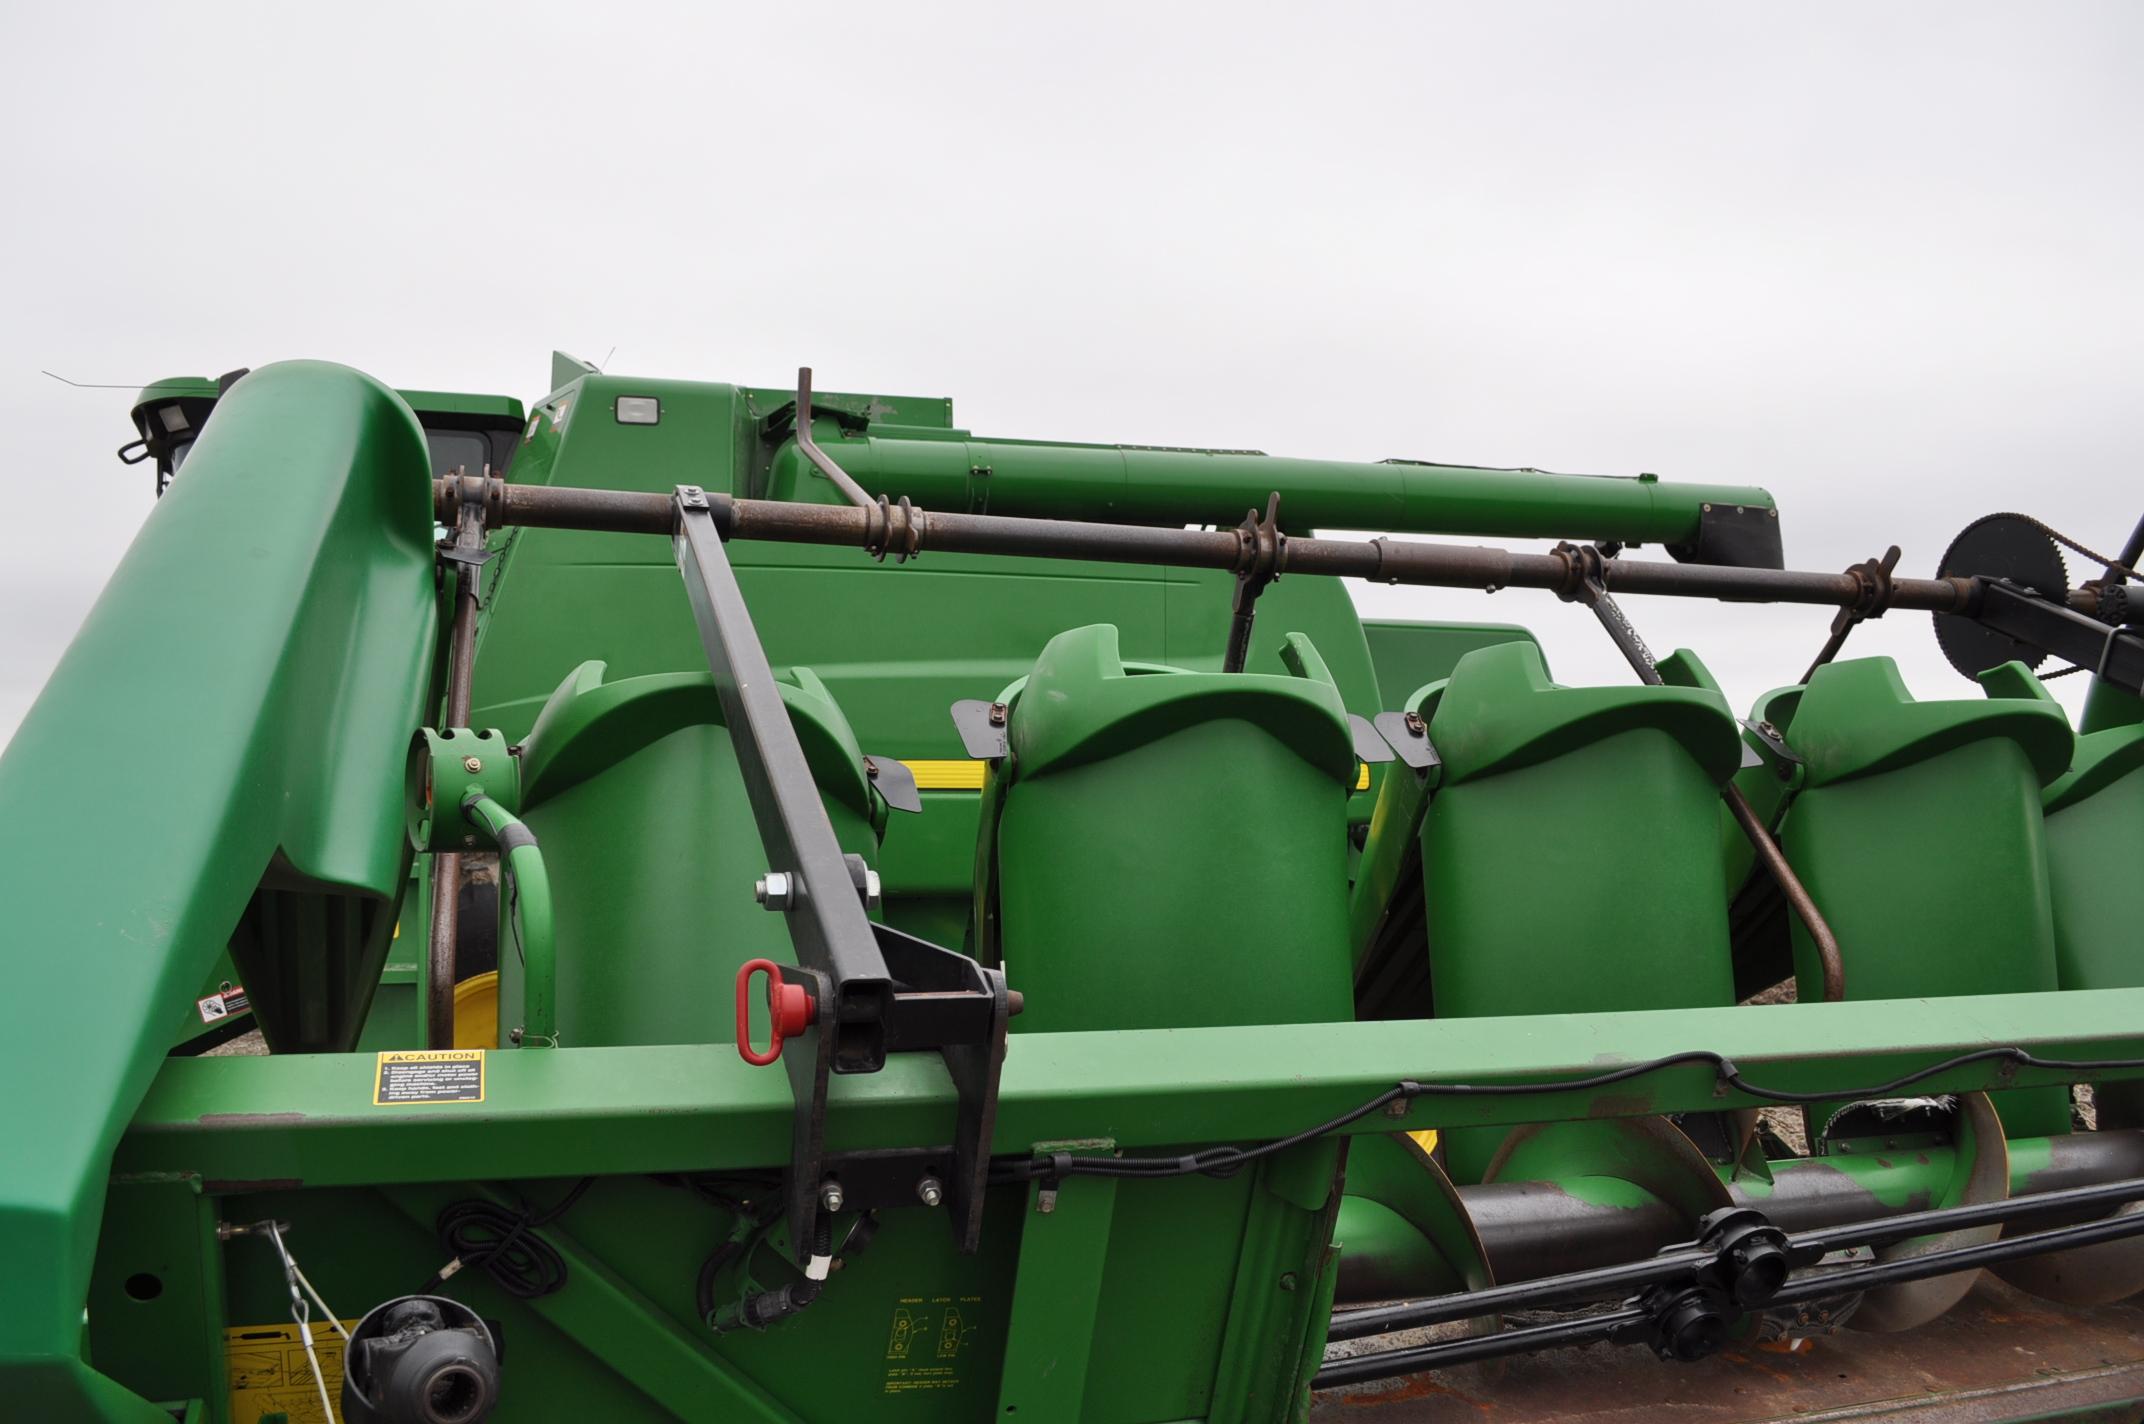 John Deere 693 corn head, poly, hyd drive, down corn reel, pto shafts, SN 655654 - Image 7 of 17